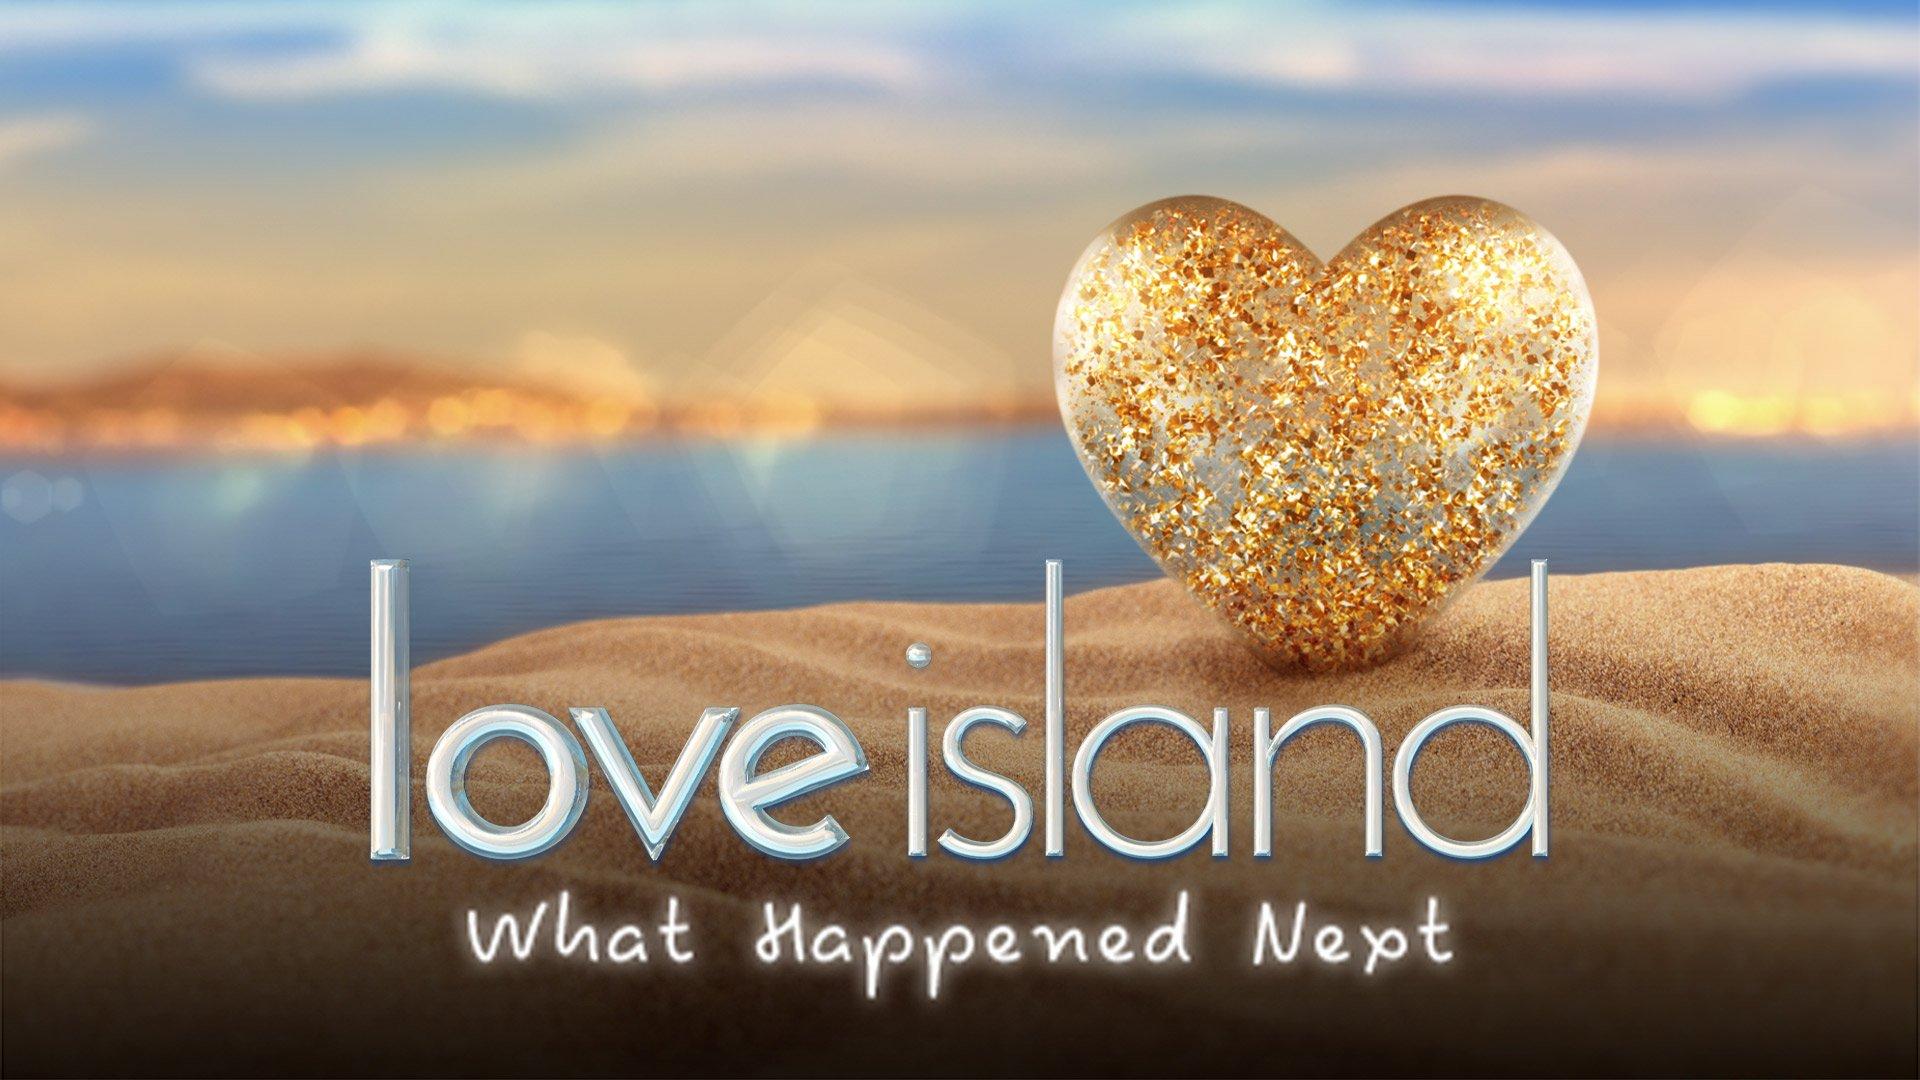 Love Island: What Happened Next? on BritBox UK